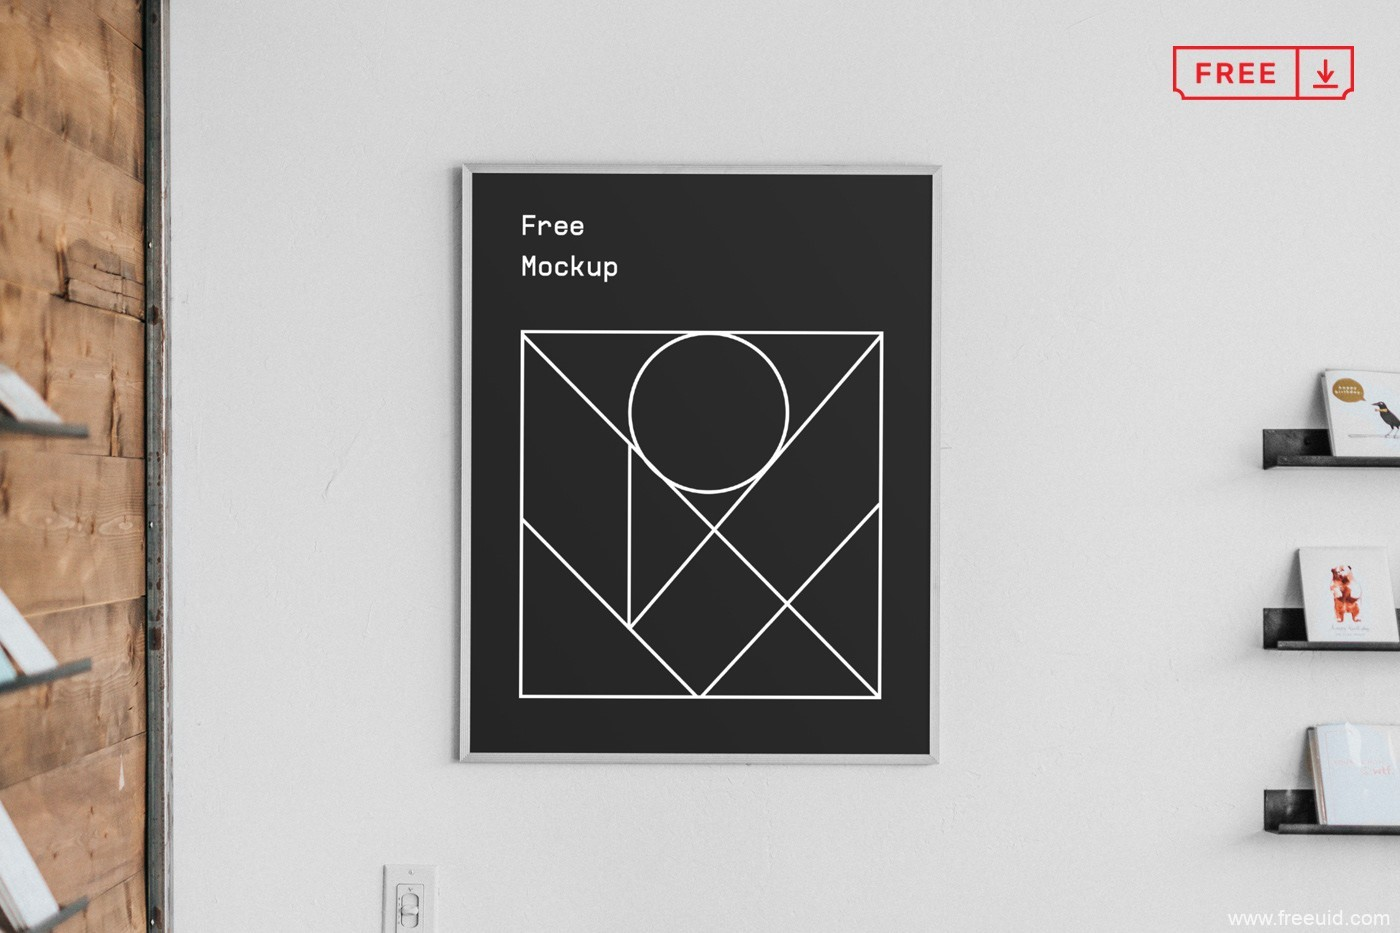 免费海报模板,海报mockup psd源文件